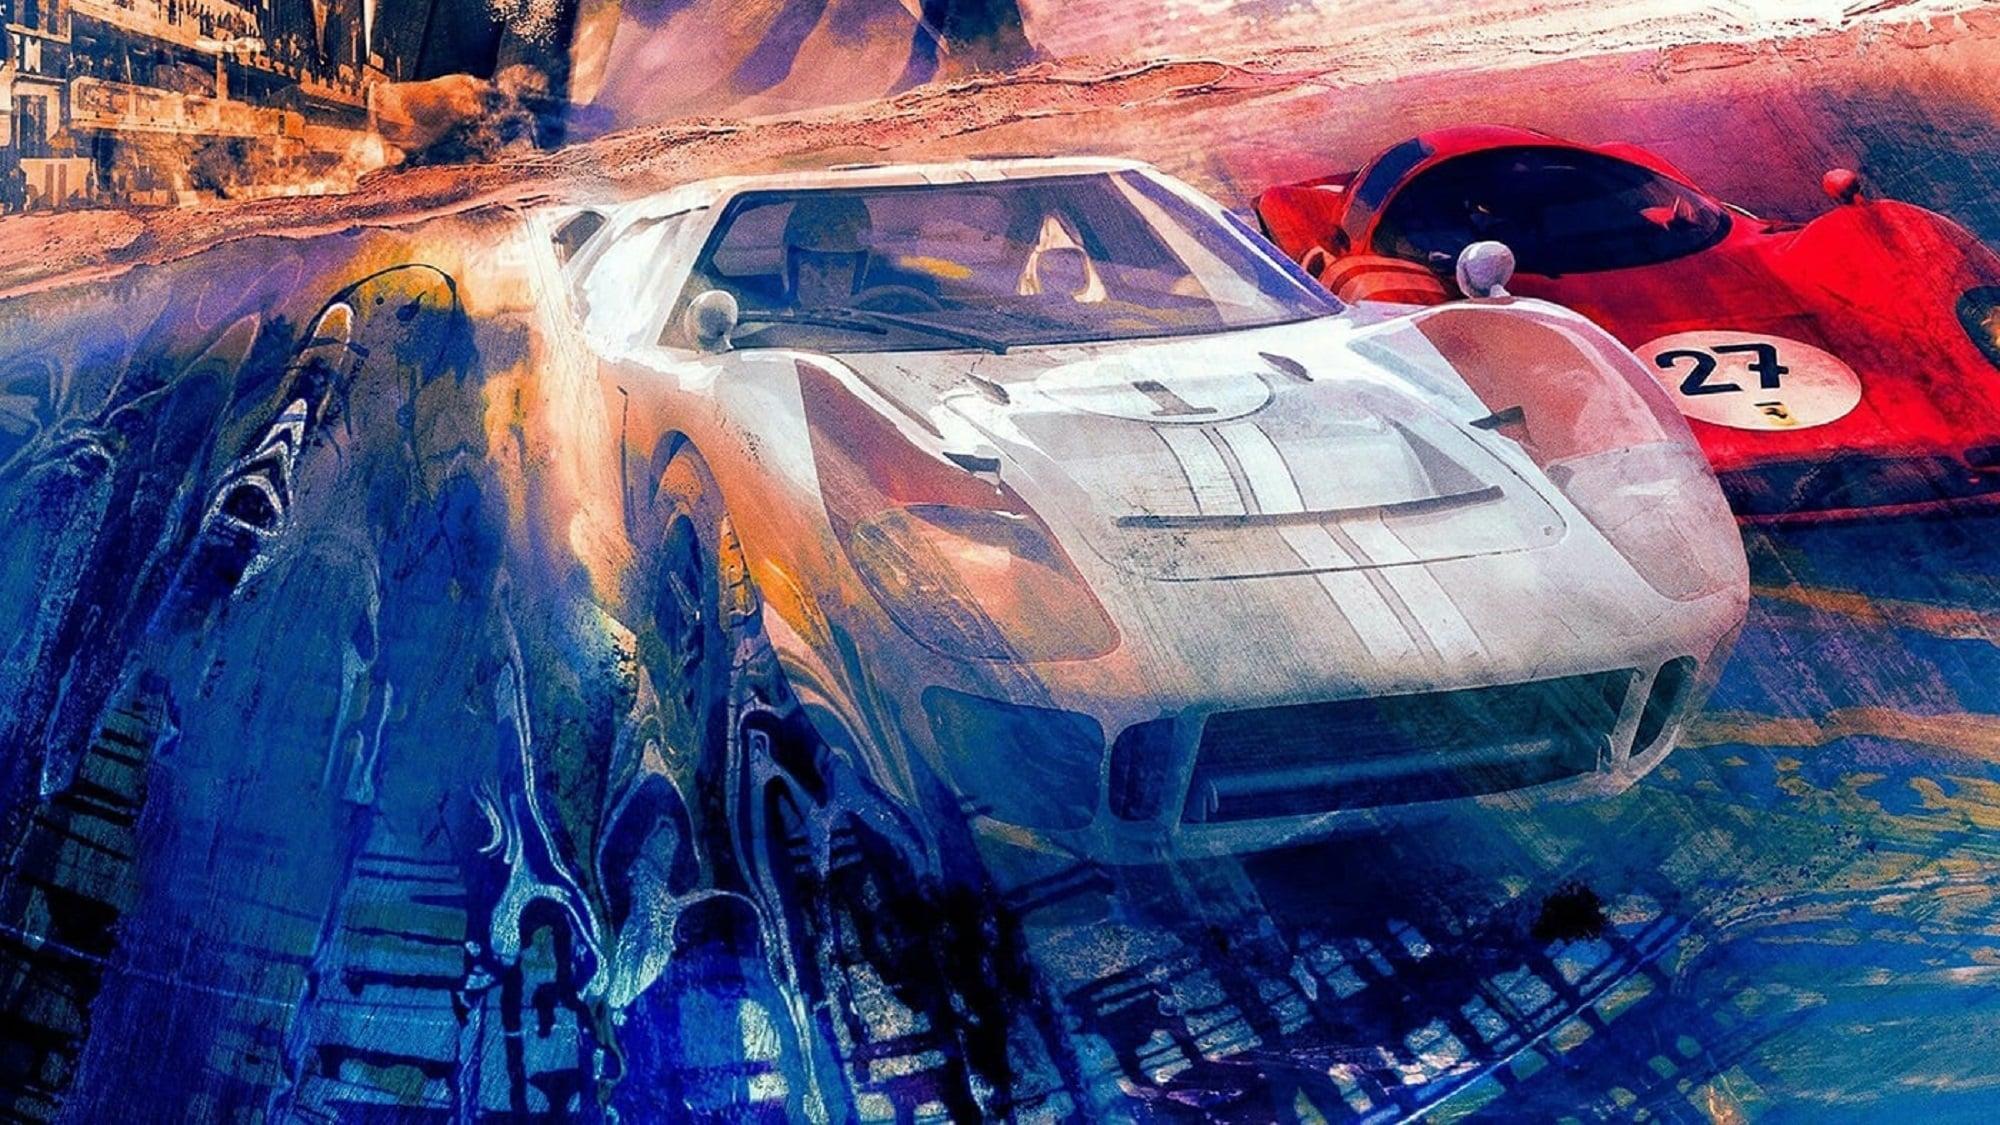 Wish Galactictechtips Xyz الصور والأفكار حول Watch Ford Vs Ferrari Online Free Movie